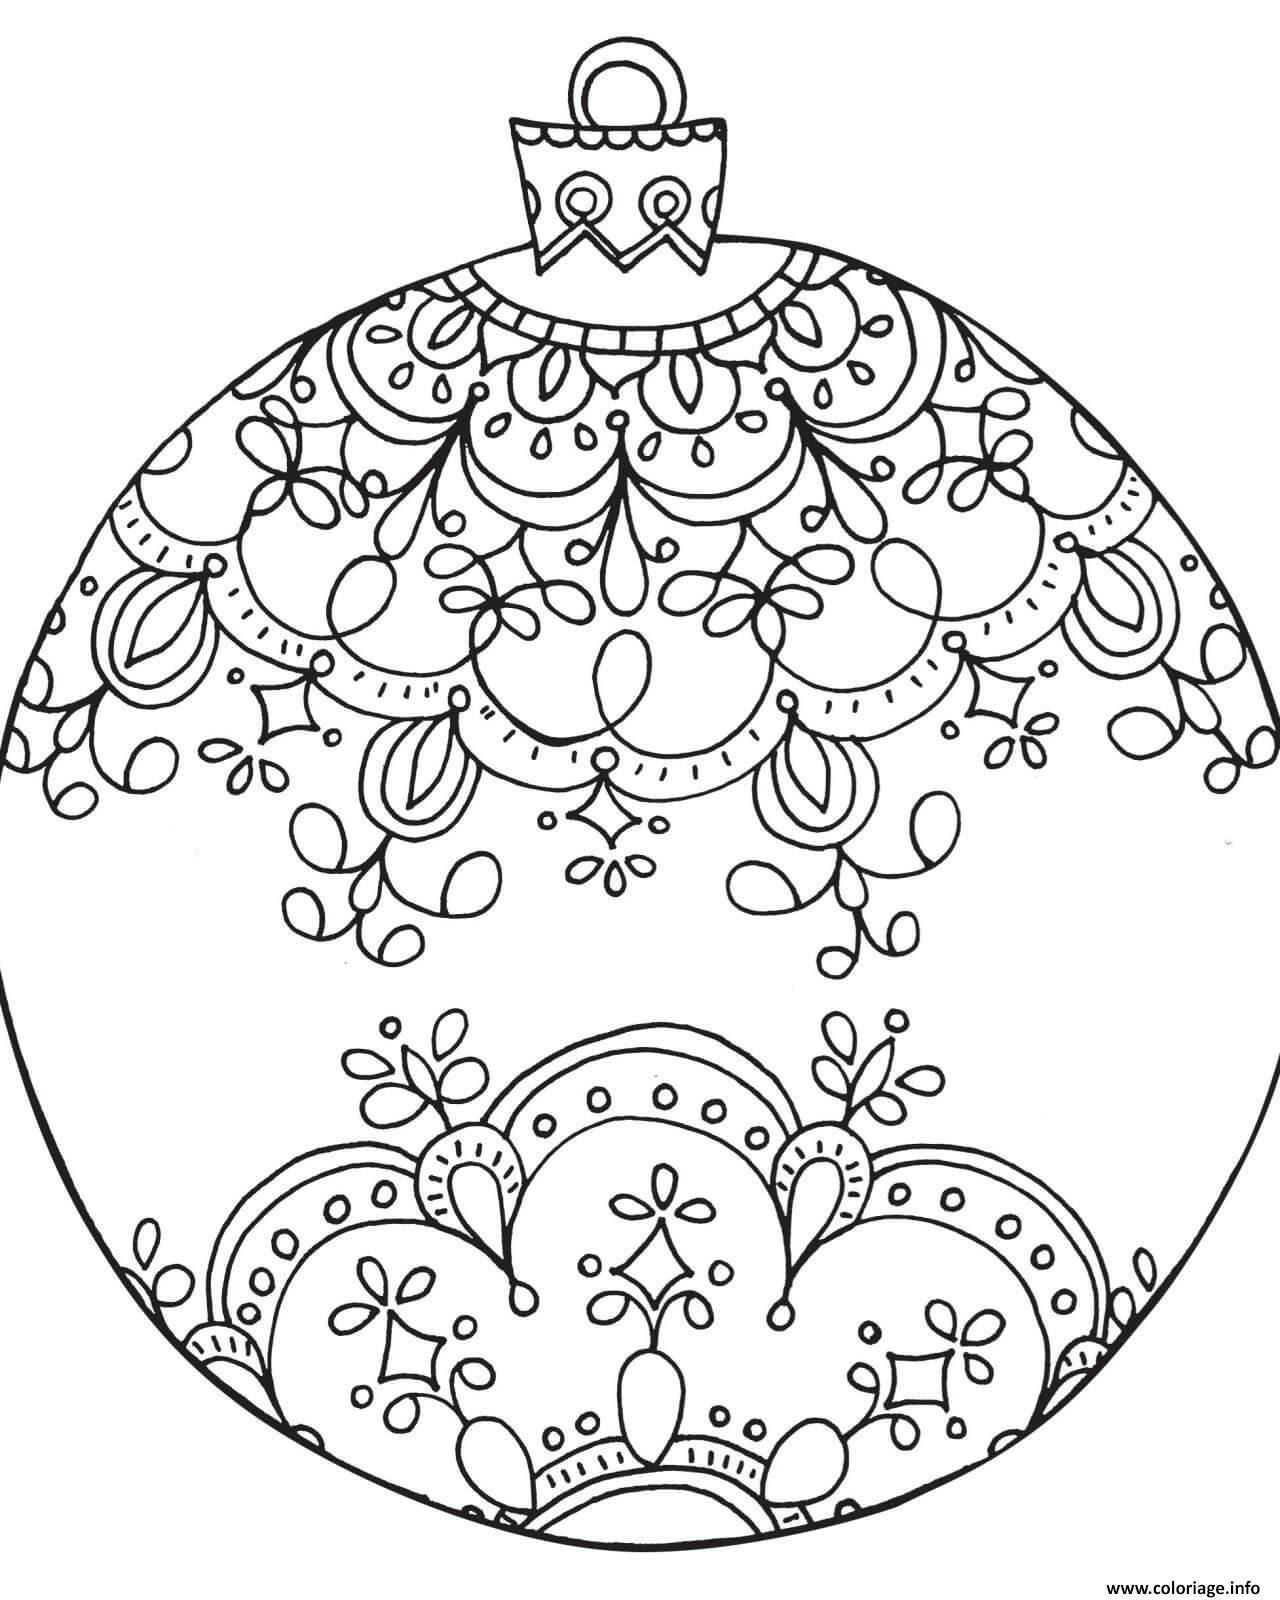 Coloriage Boule De Noel Adulte Noel Dessin  Imprimer